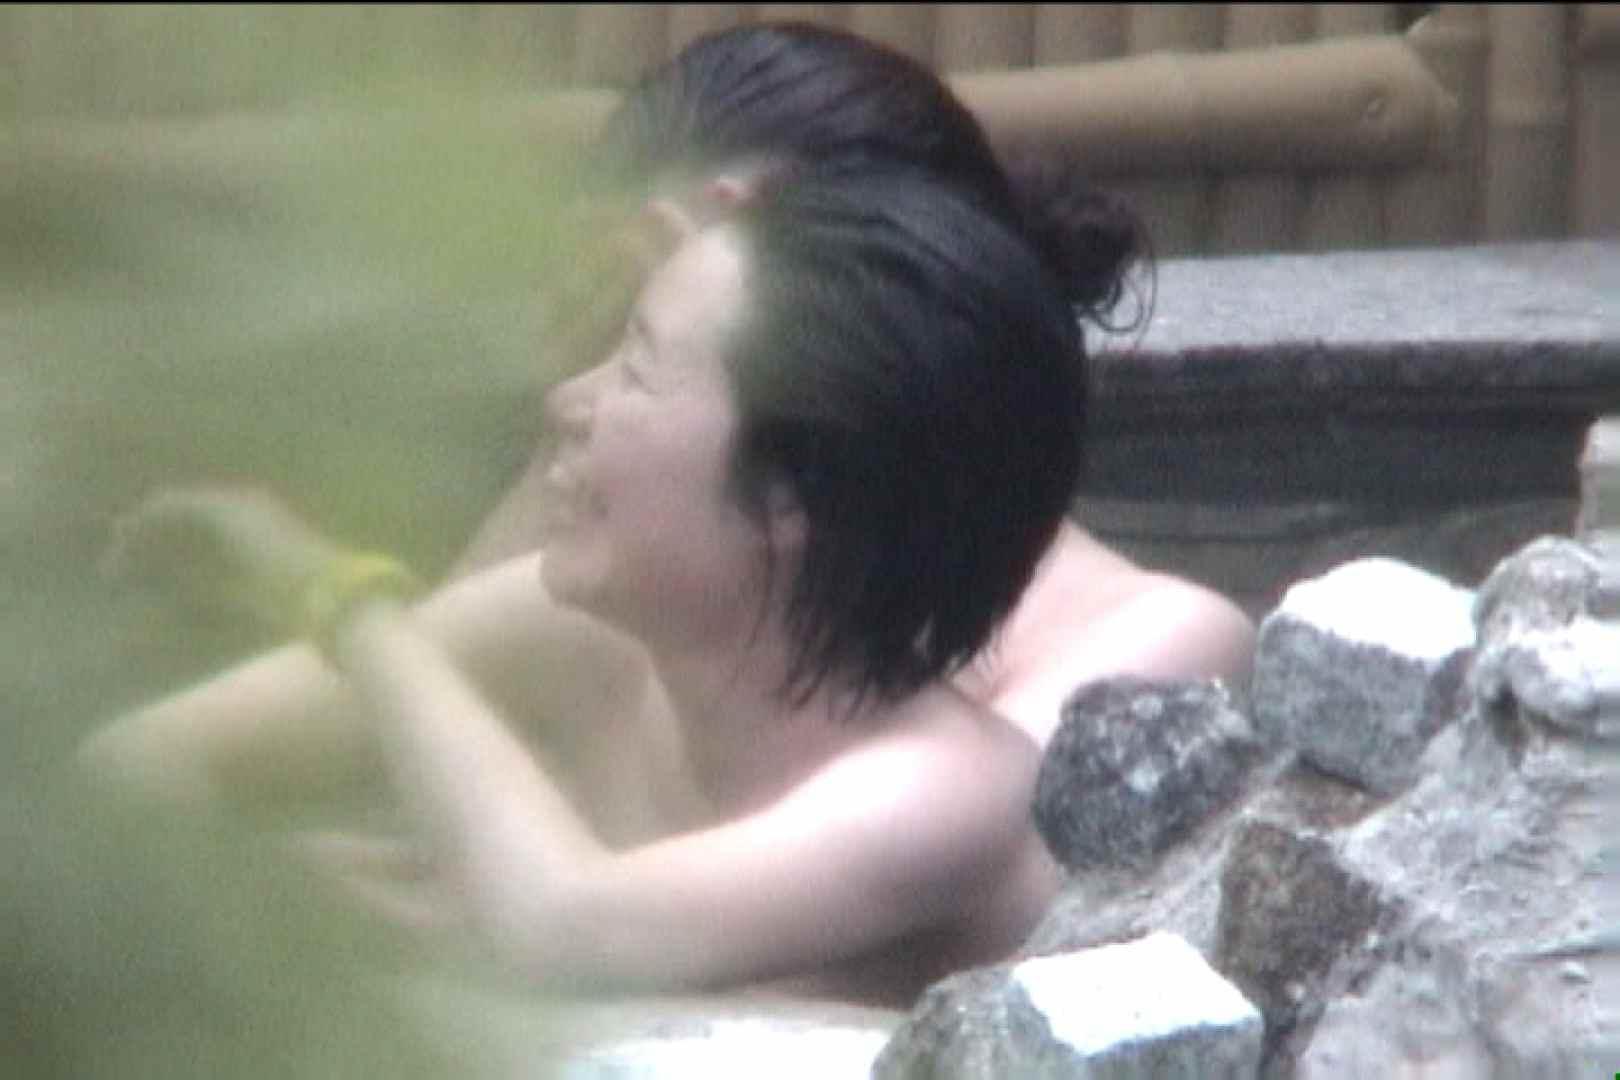 Aquaな露天風呂Vol.93【VIP限定】 盗撮シリーズ   露天風呂編  76PIX 31